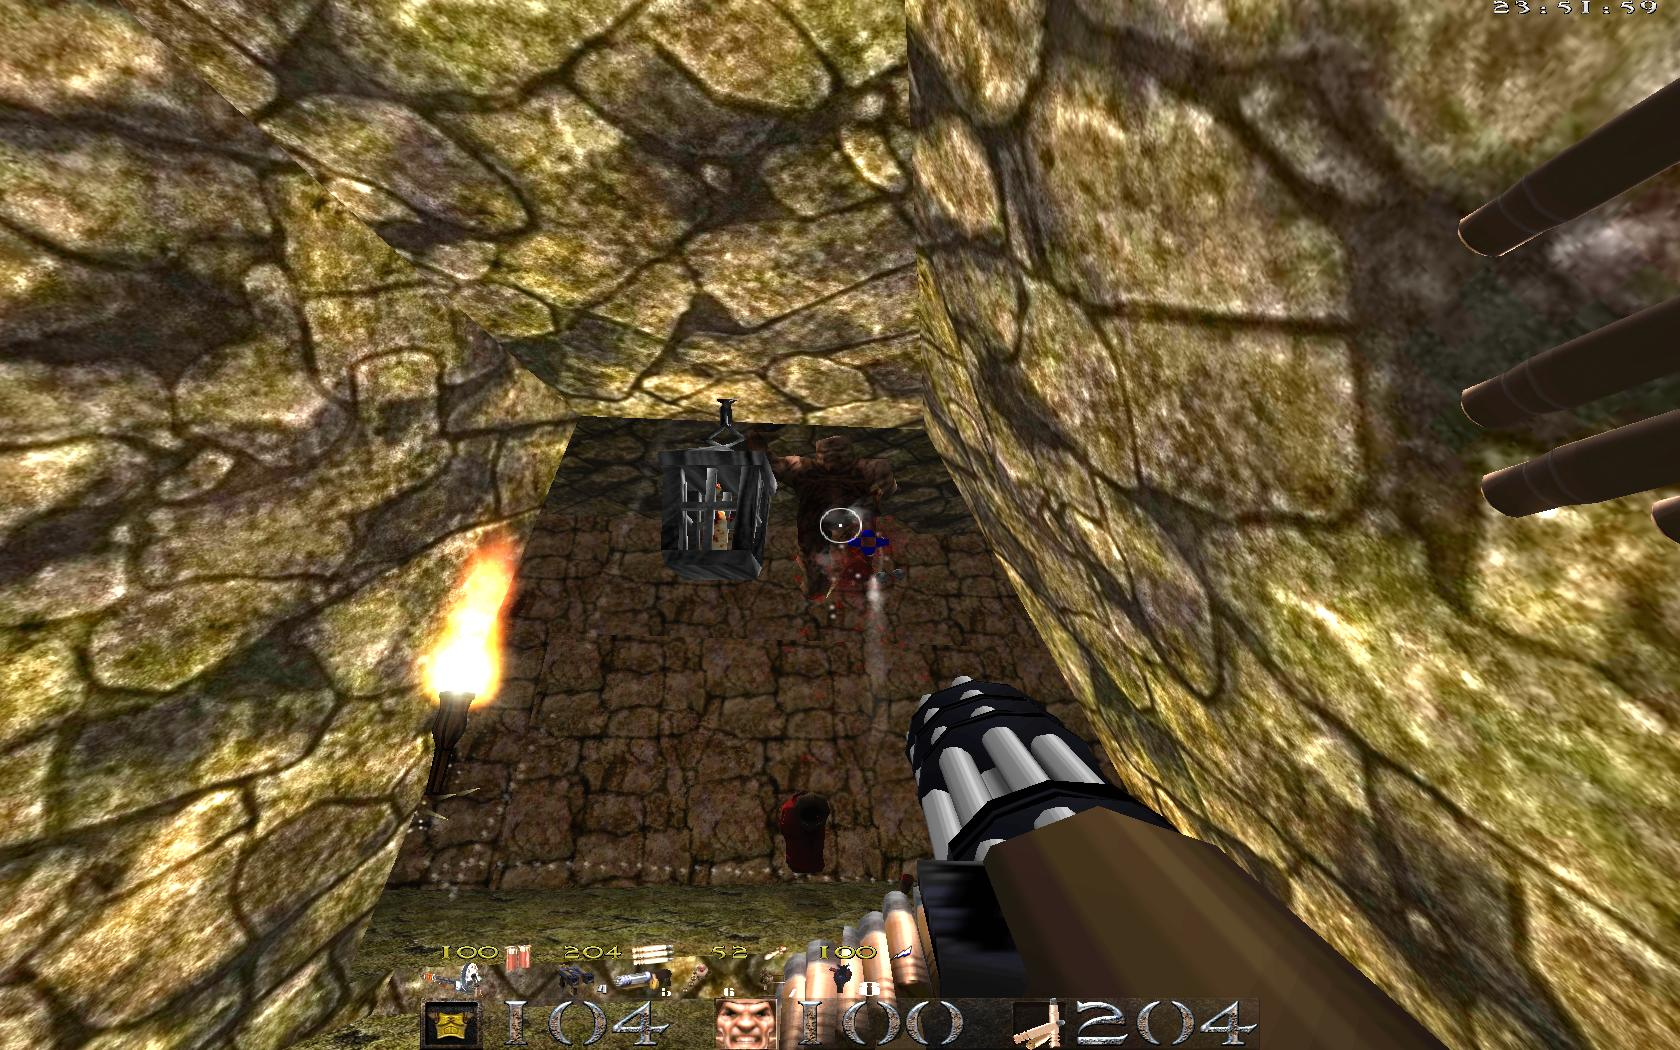 Quake Mountain addon for Quake 1 (qrack port) - монстр появляется в воздухе и там зависает - Quake Мод